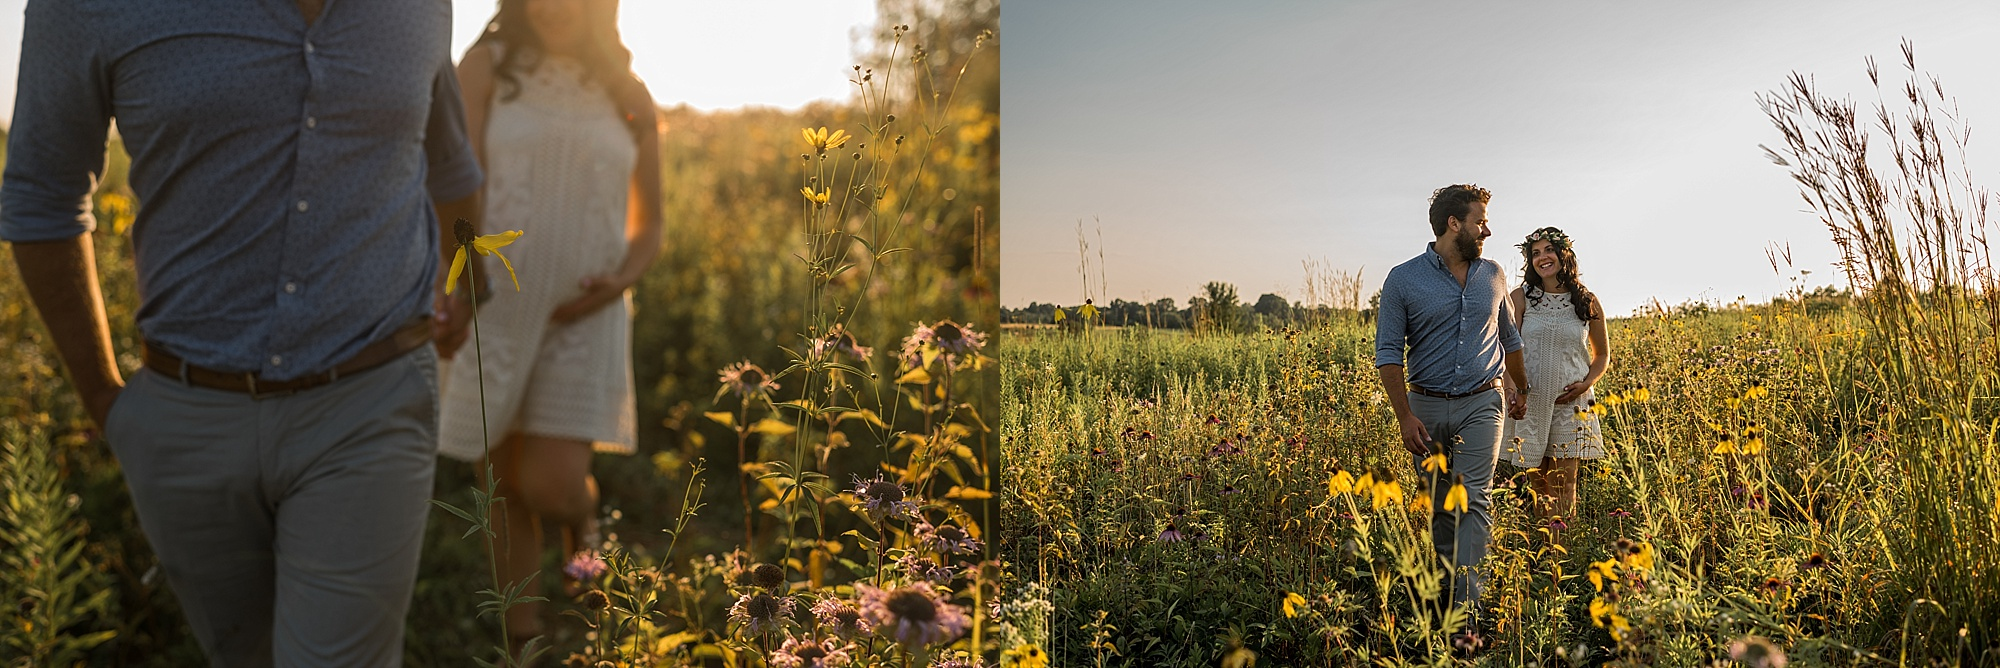 lauren-grayson-photography-cleveland-ohio-photographer-maternity-summer-outdoor-bohemian-fields-session_0483.jpg